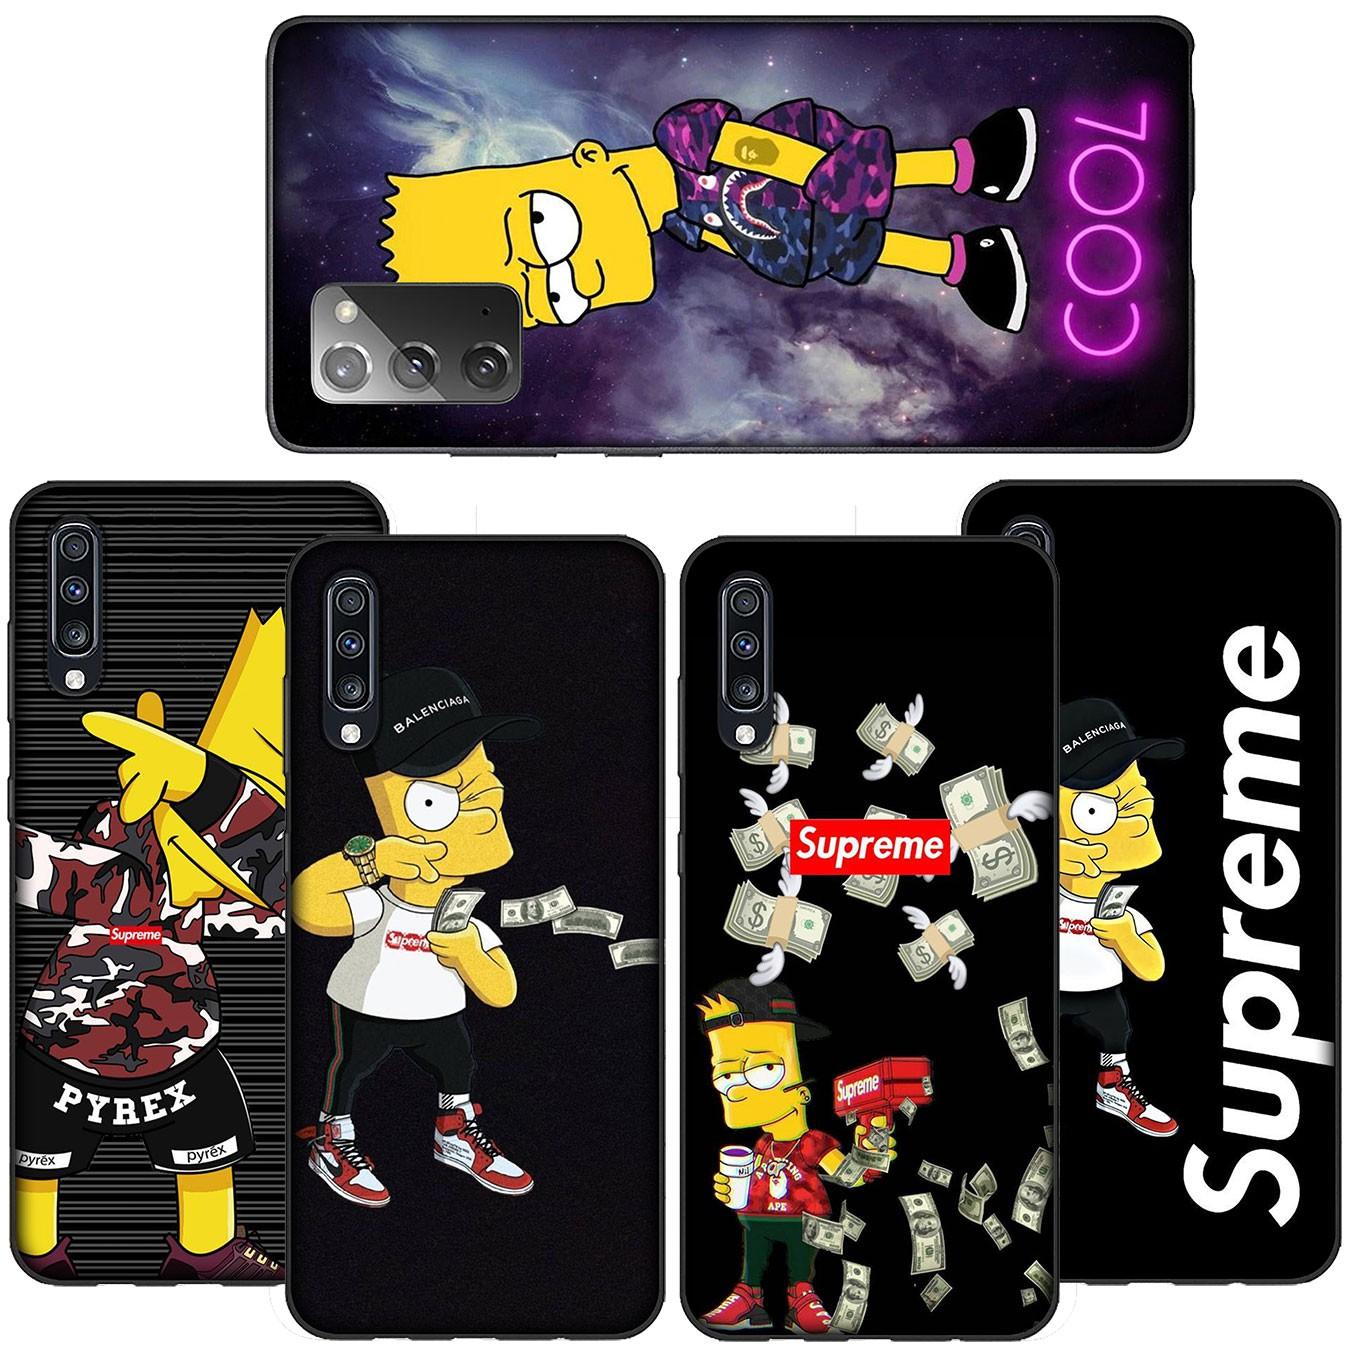 Ốp Điện Thoại Silicon Mềm Hình The Simpsons Cho Xiaomi Redmi Note 5 Pro Plus 5a 4x S2 Mi Poco X3 Nfc Pocophone F1 A44